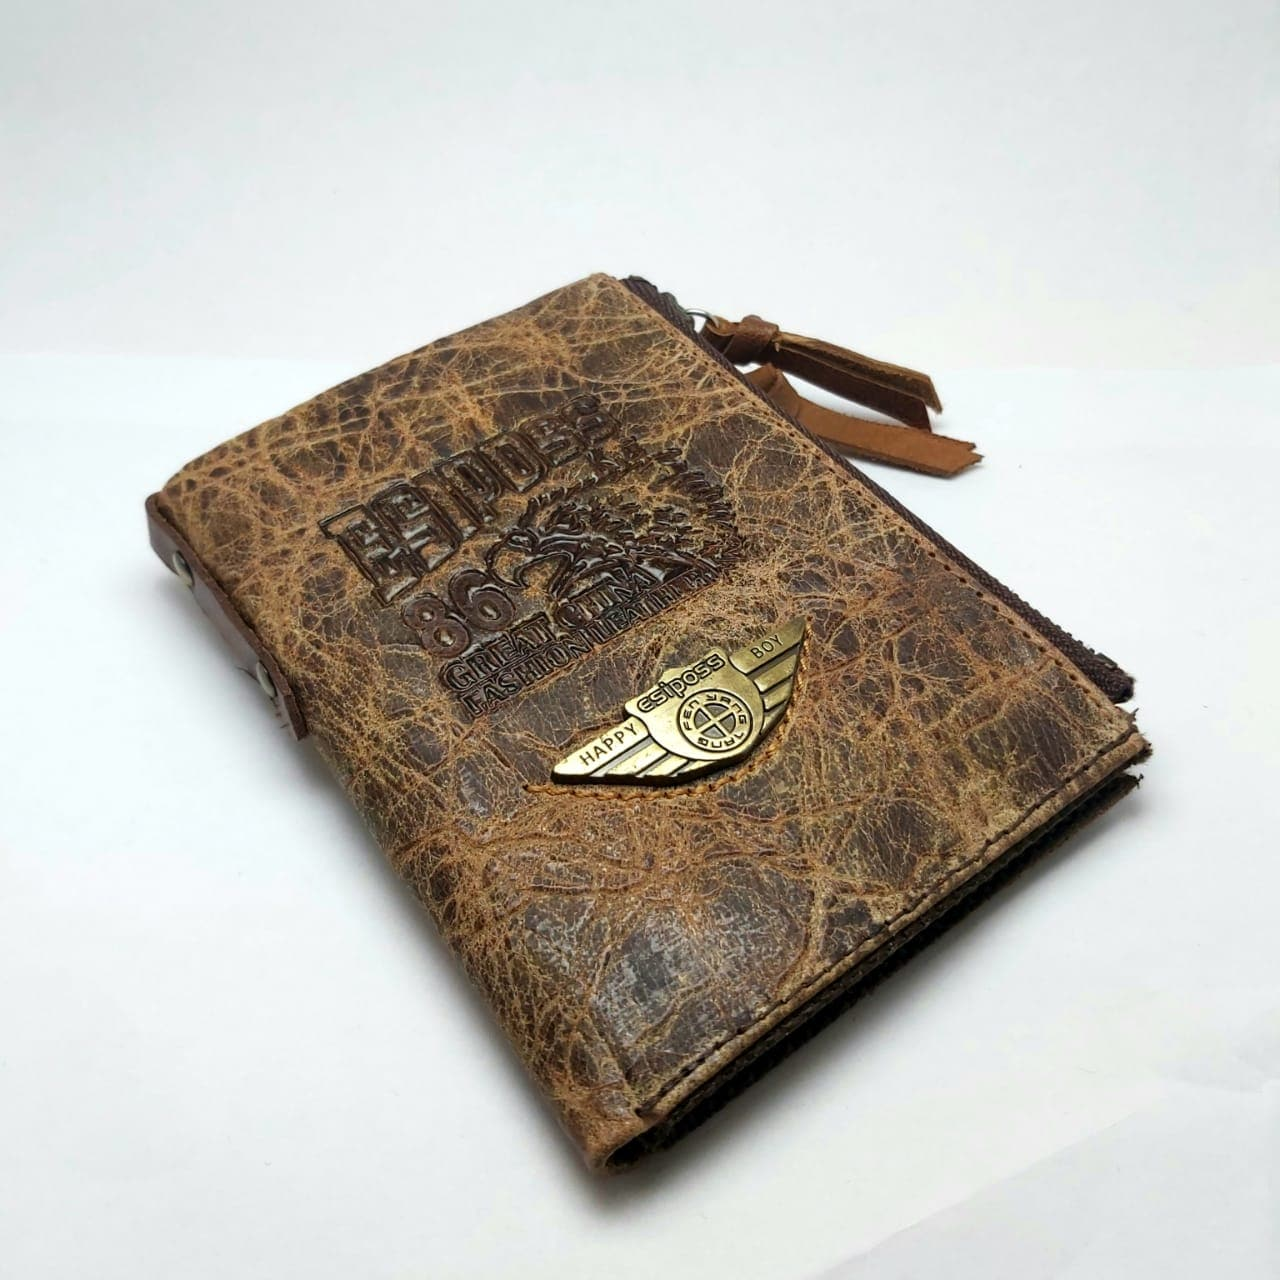 ESIPOSS Wallet EP07 Men Genuine Leather Men Purse Vintage With Zipper Coin Pocket Famous Brand Designer Wallets For Men Money Bag